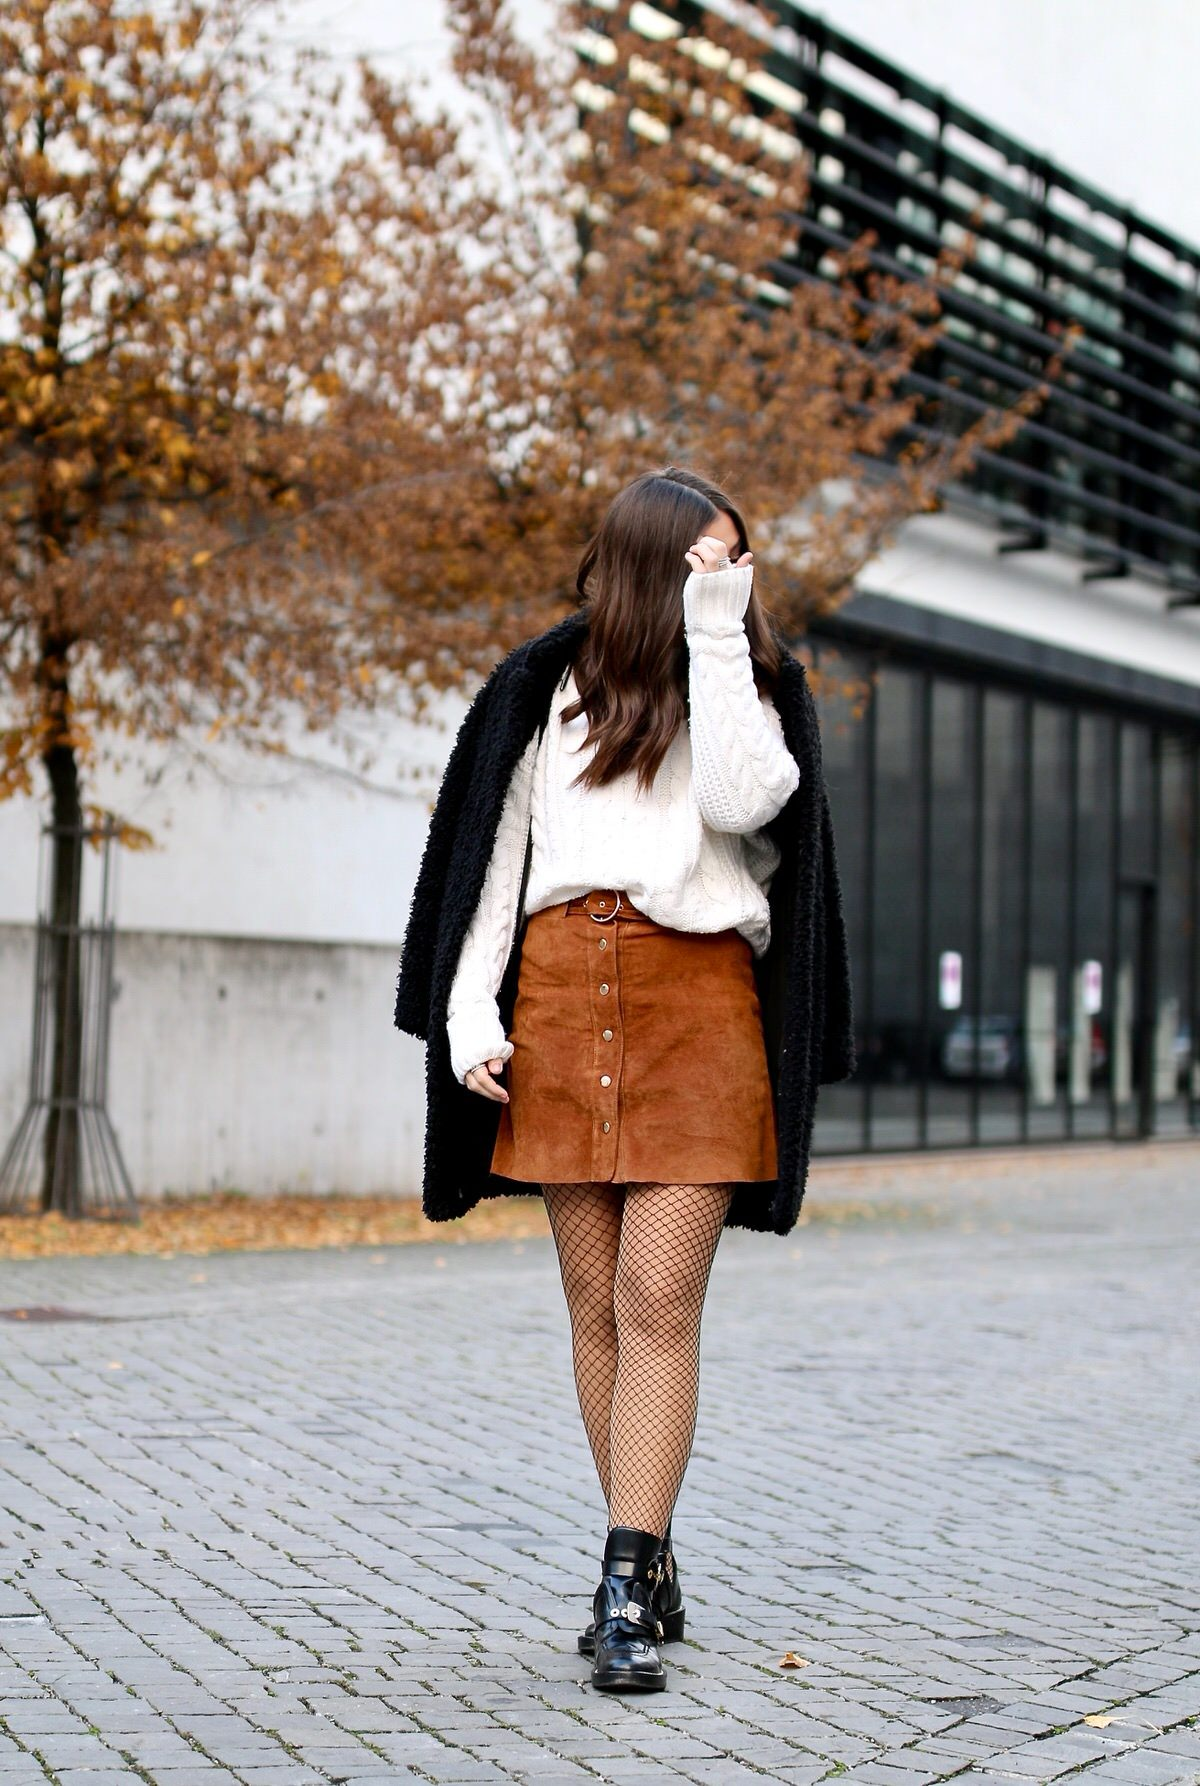 herbst outfit netzstrumpfhose wildleder rock balenciaga ceinture boots veronique sophie. Black Bedroom Furniture Sets. Home Design Ideas